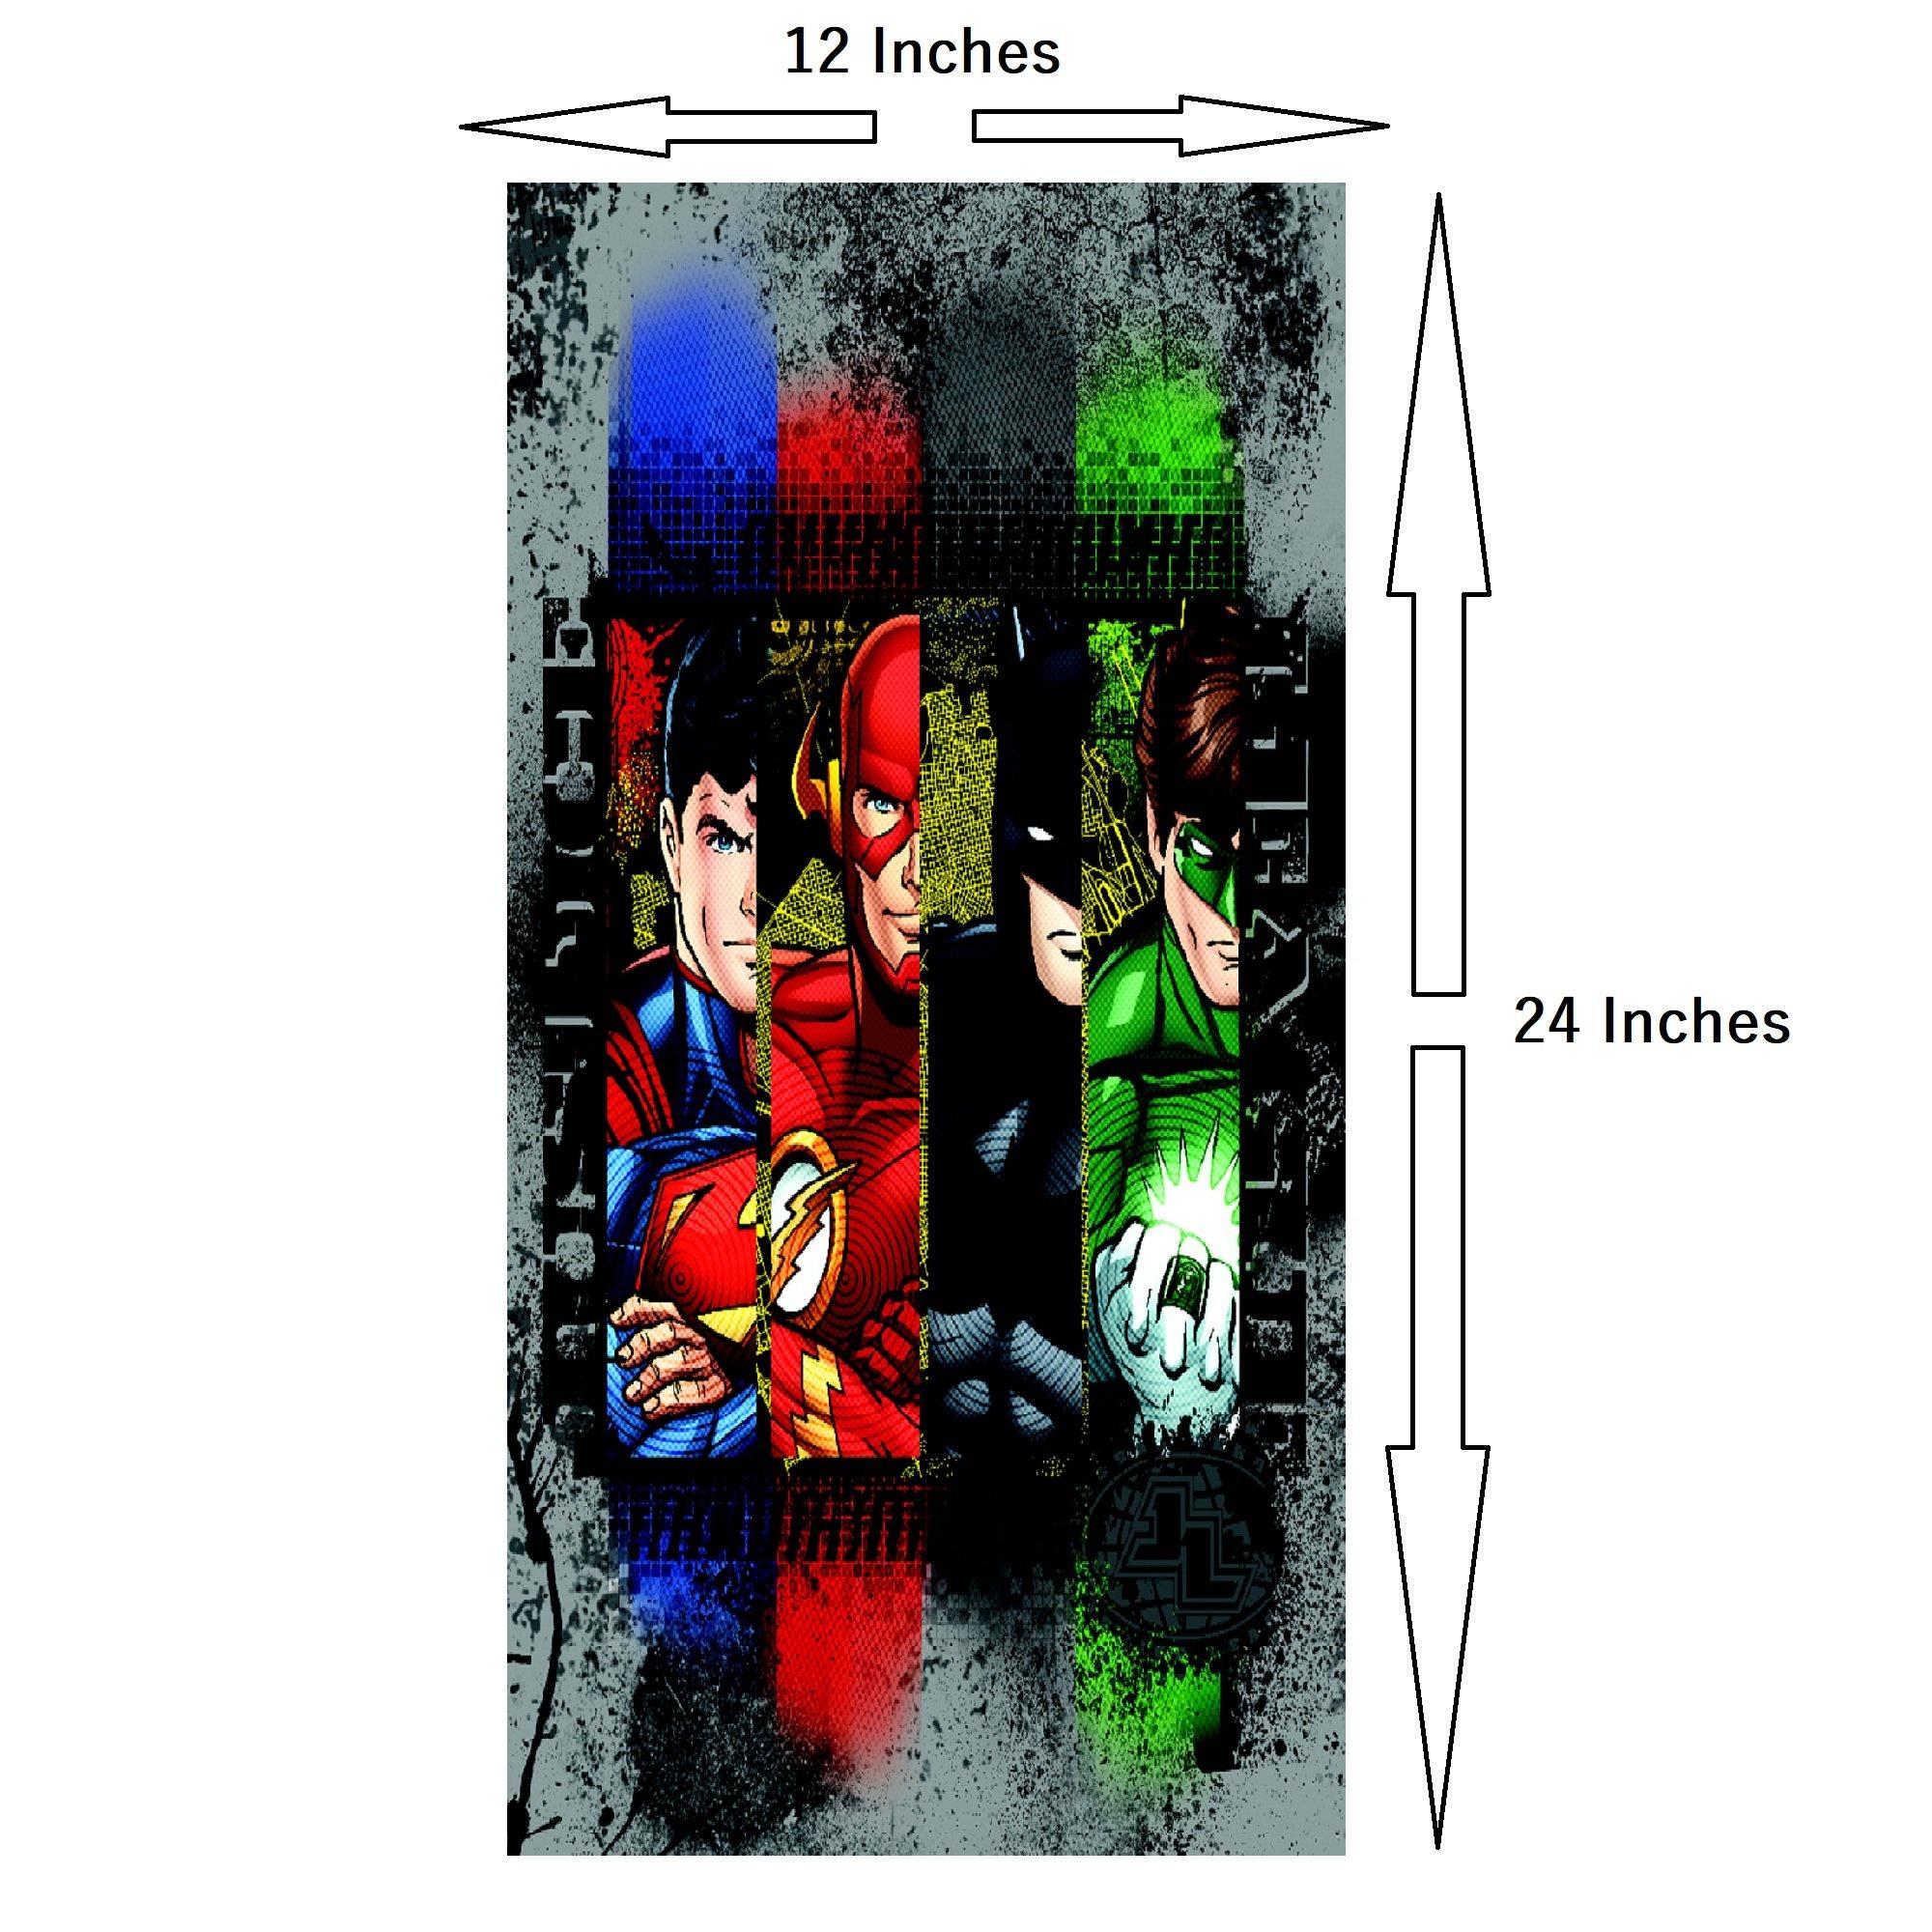 Modern Littles Justice League 5 Piece Canvas Wall Art Set Featuring Superhero Character Designs of Superman, Batman, Green Lantern and Flash Gordon, Multicolored by Modern Littles (Image #2)